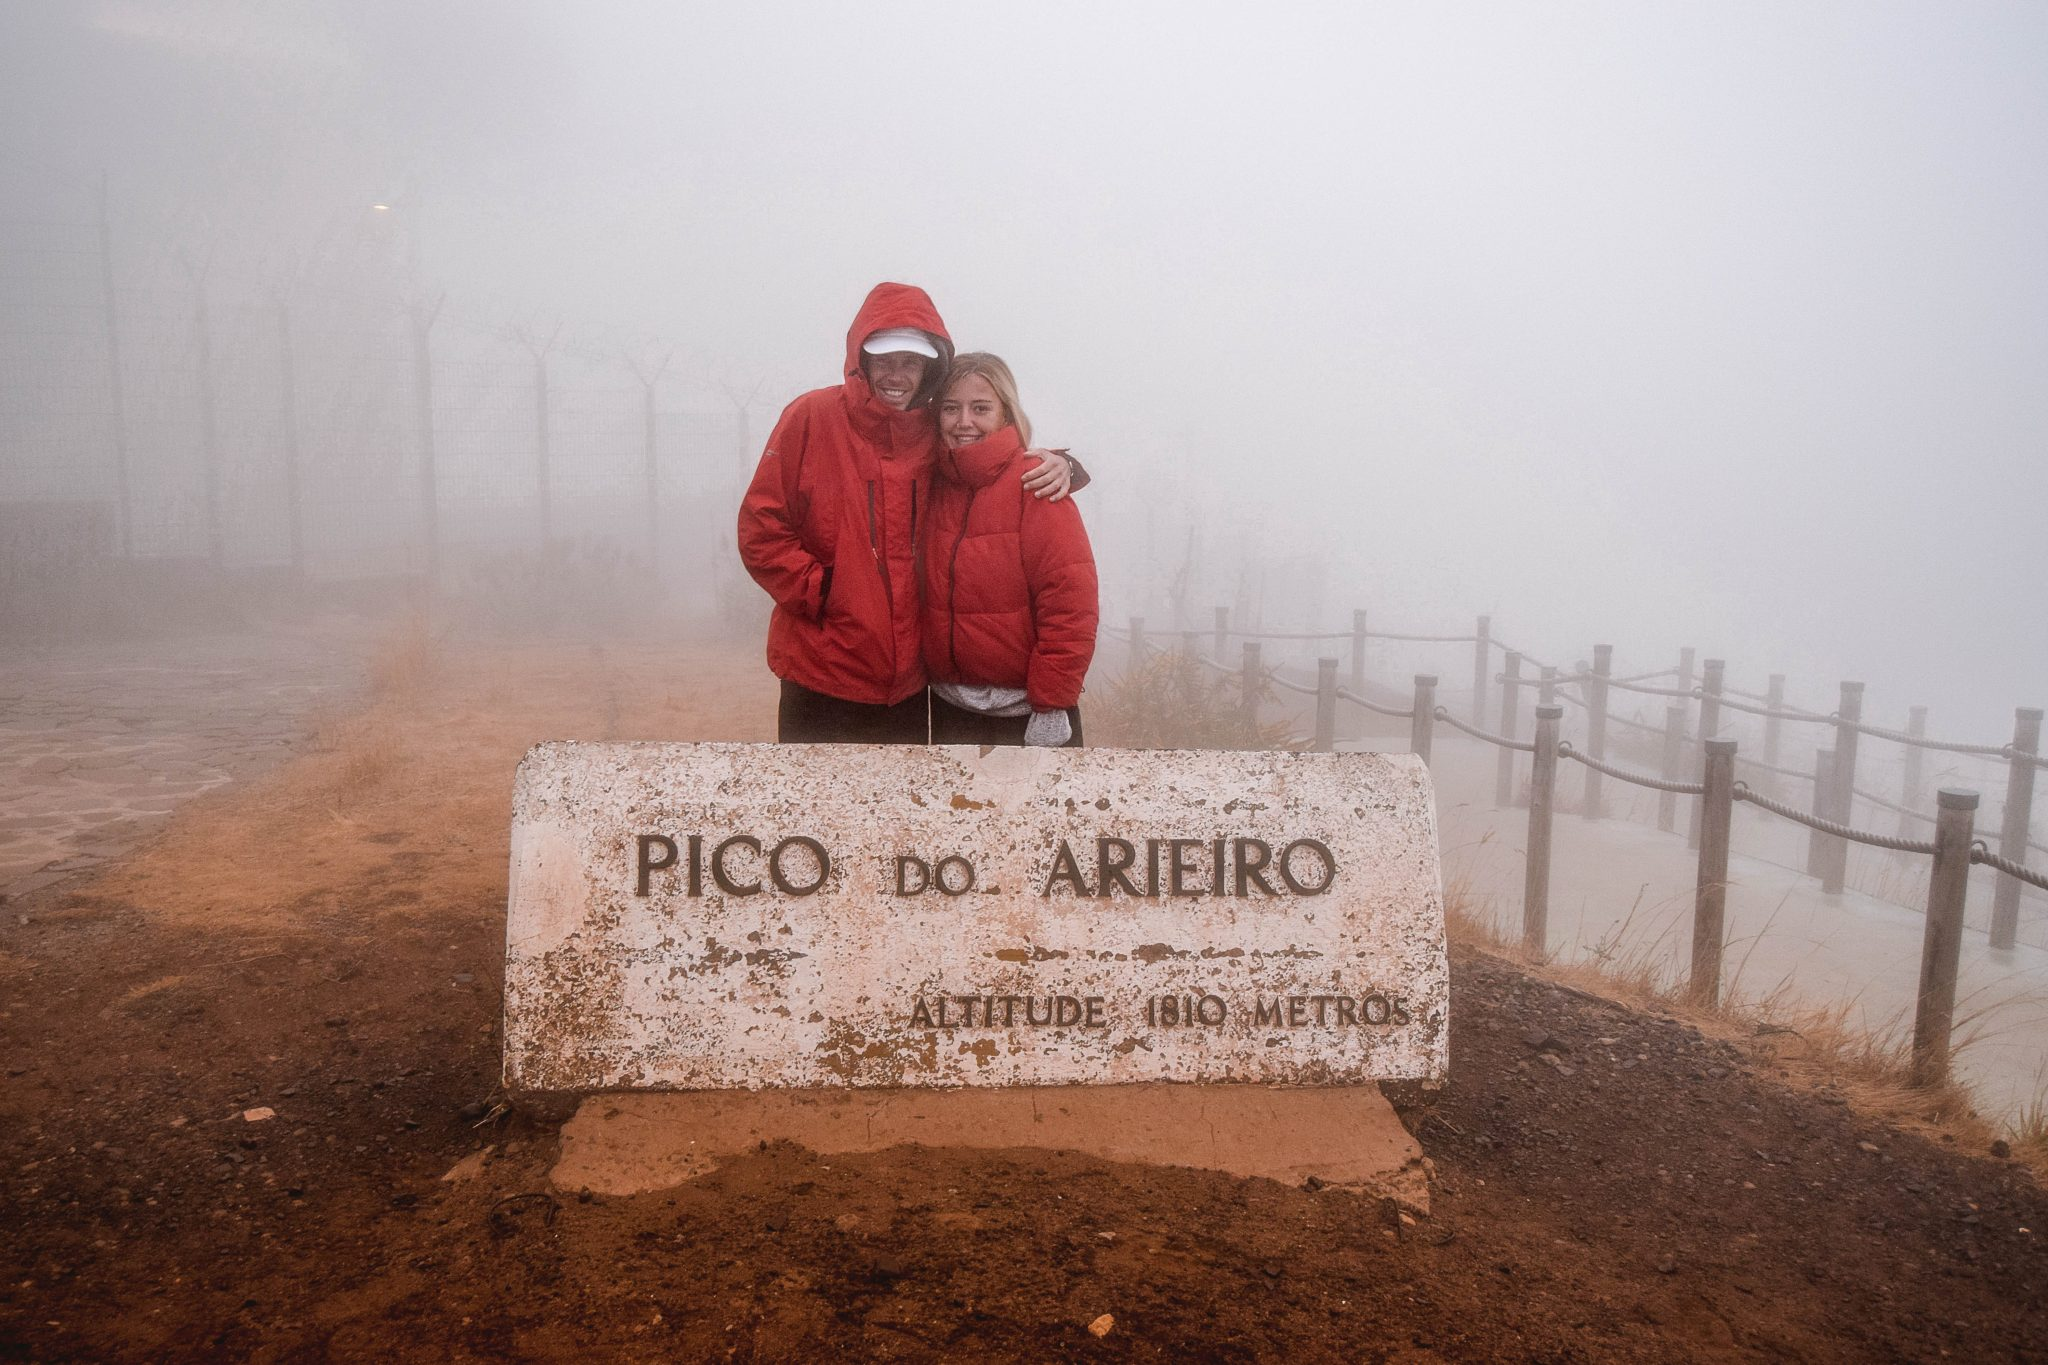 Wanderers & Warriors - Charlie & Lauren UK Travel Couple - Things To Do In Madeira Things To Do - Pico do Arieiro Madeira